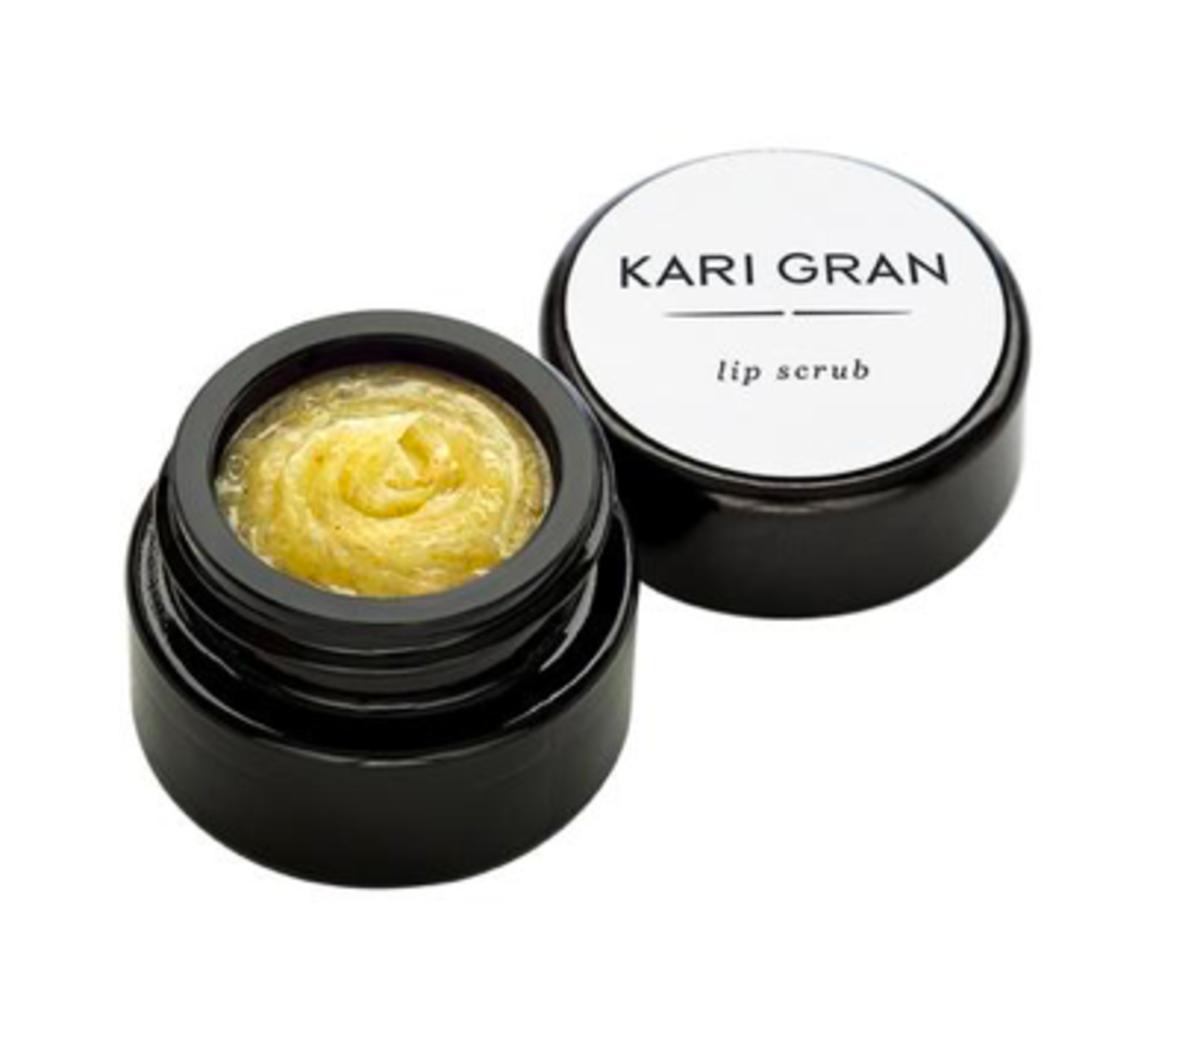 Kari Gran Lip Scrub $18.00